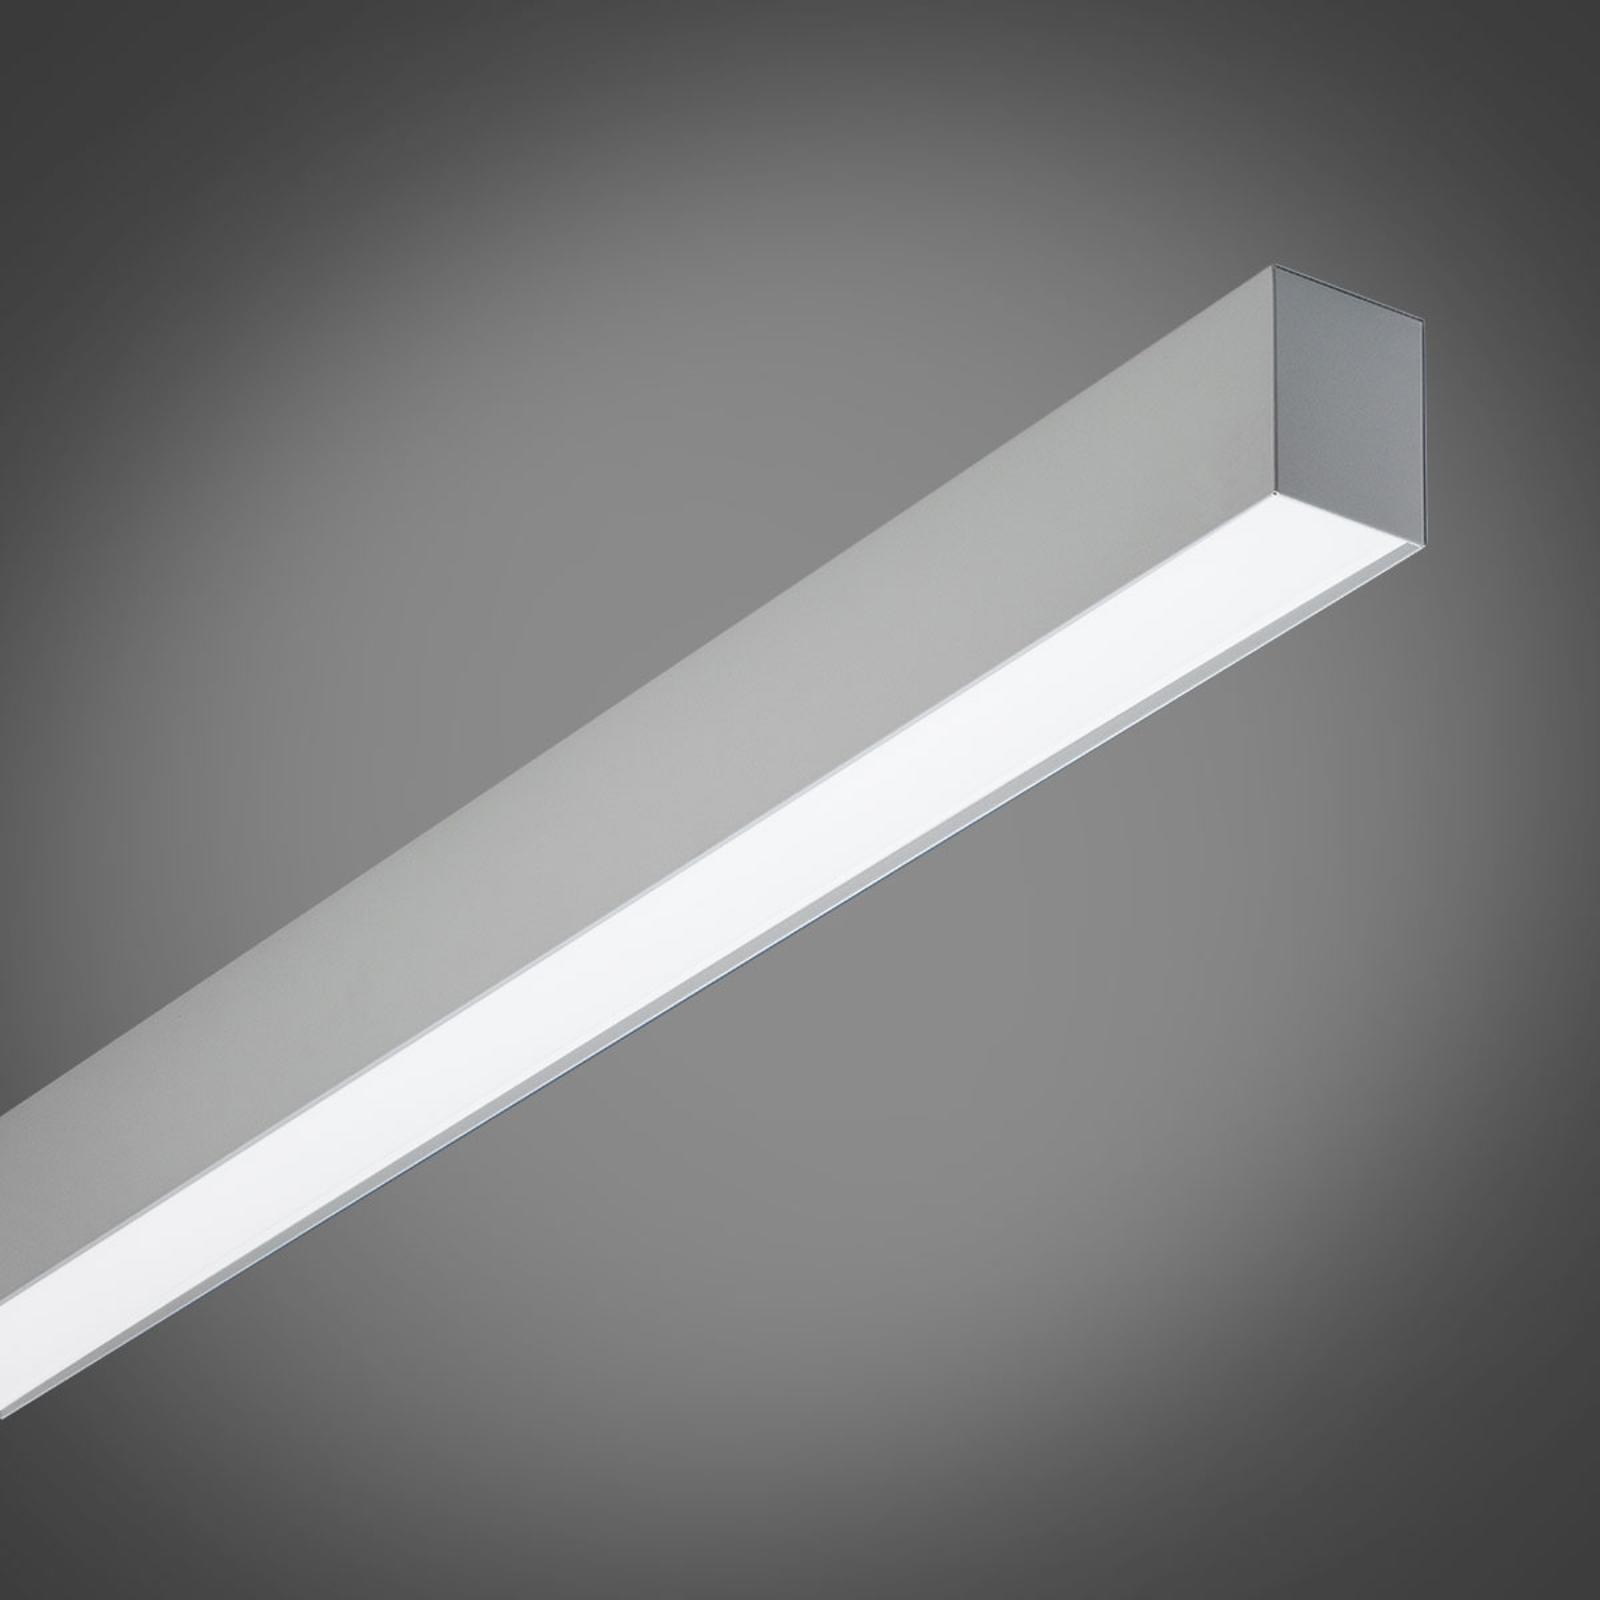 Applique LED LIPW075 lumineuse, 4000K